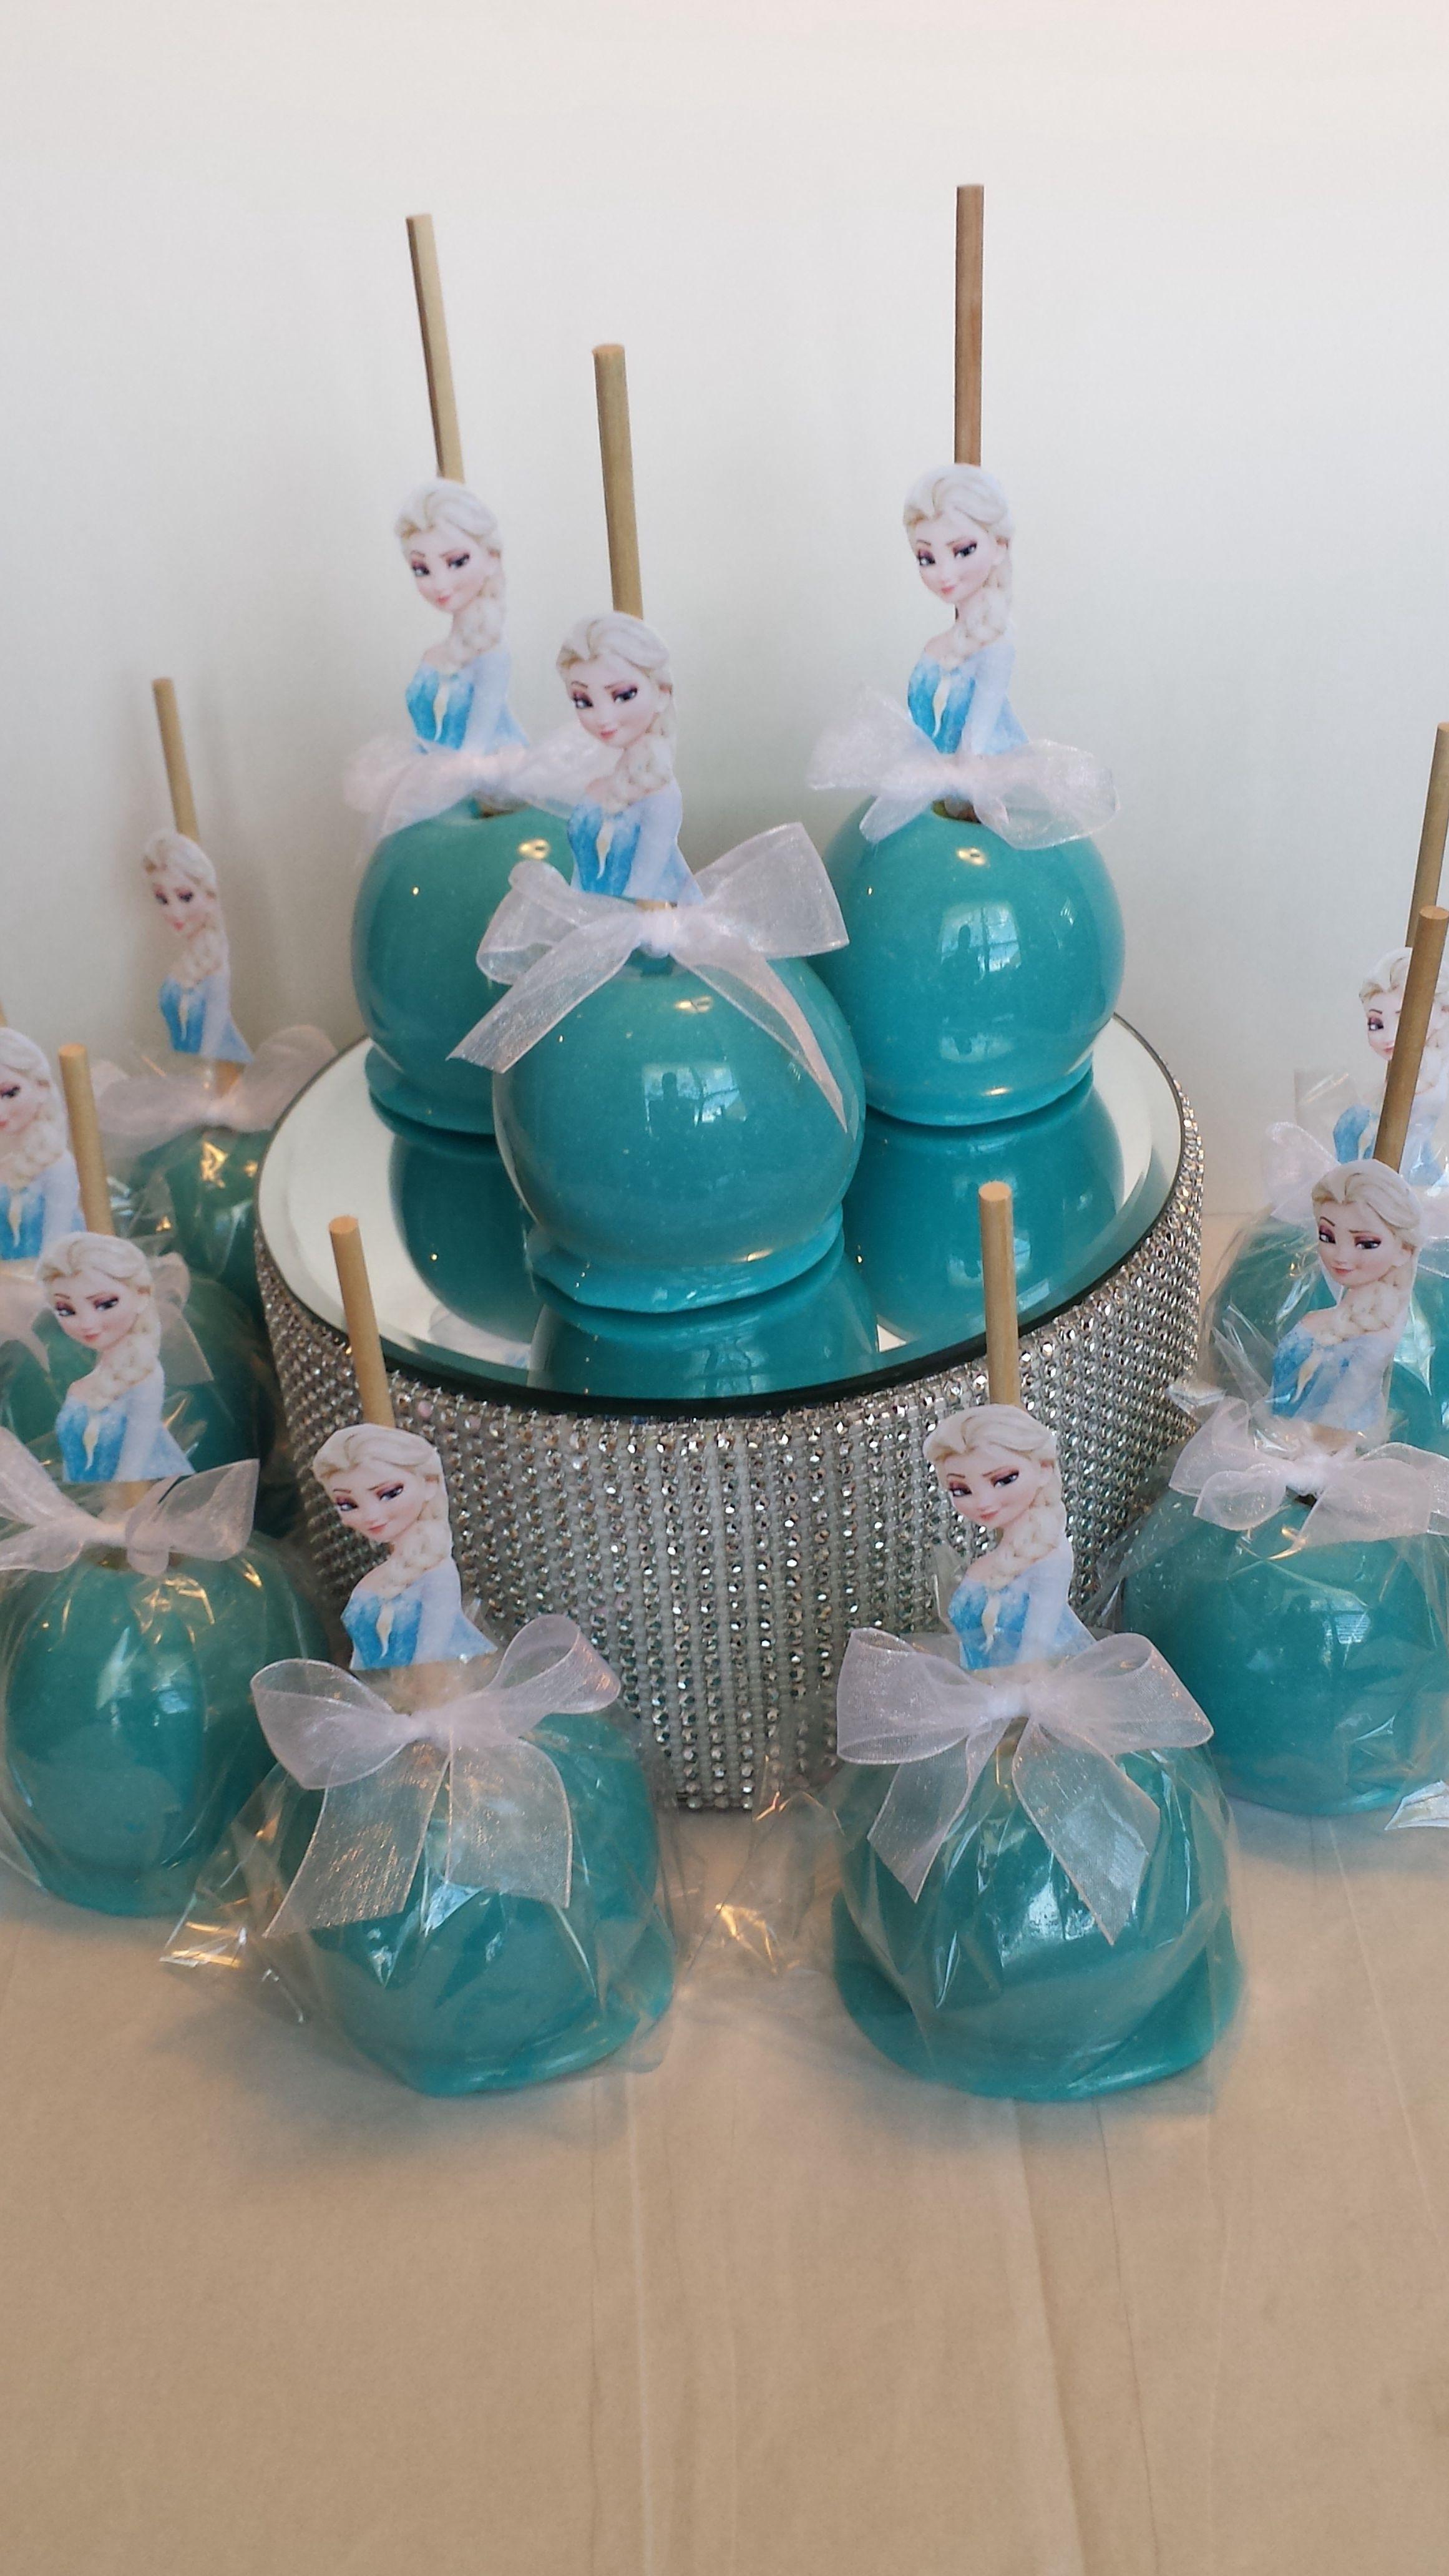 Fiesta de cumplea os frozen 100 ideas originales candy - Ideas originales para cumpleanos ...